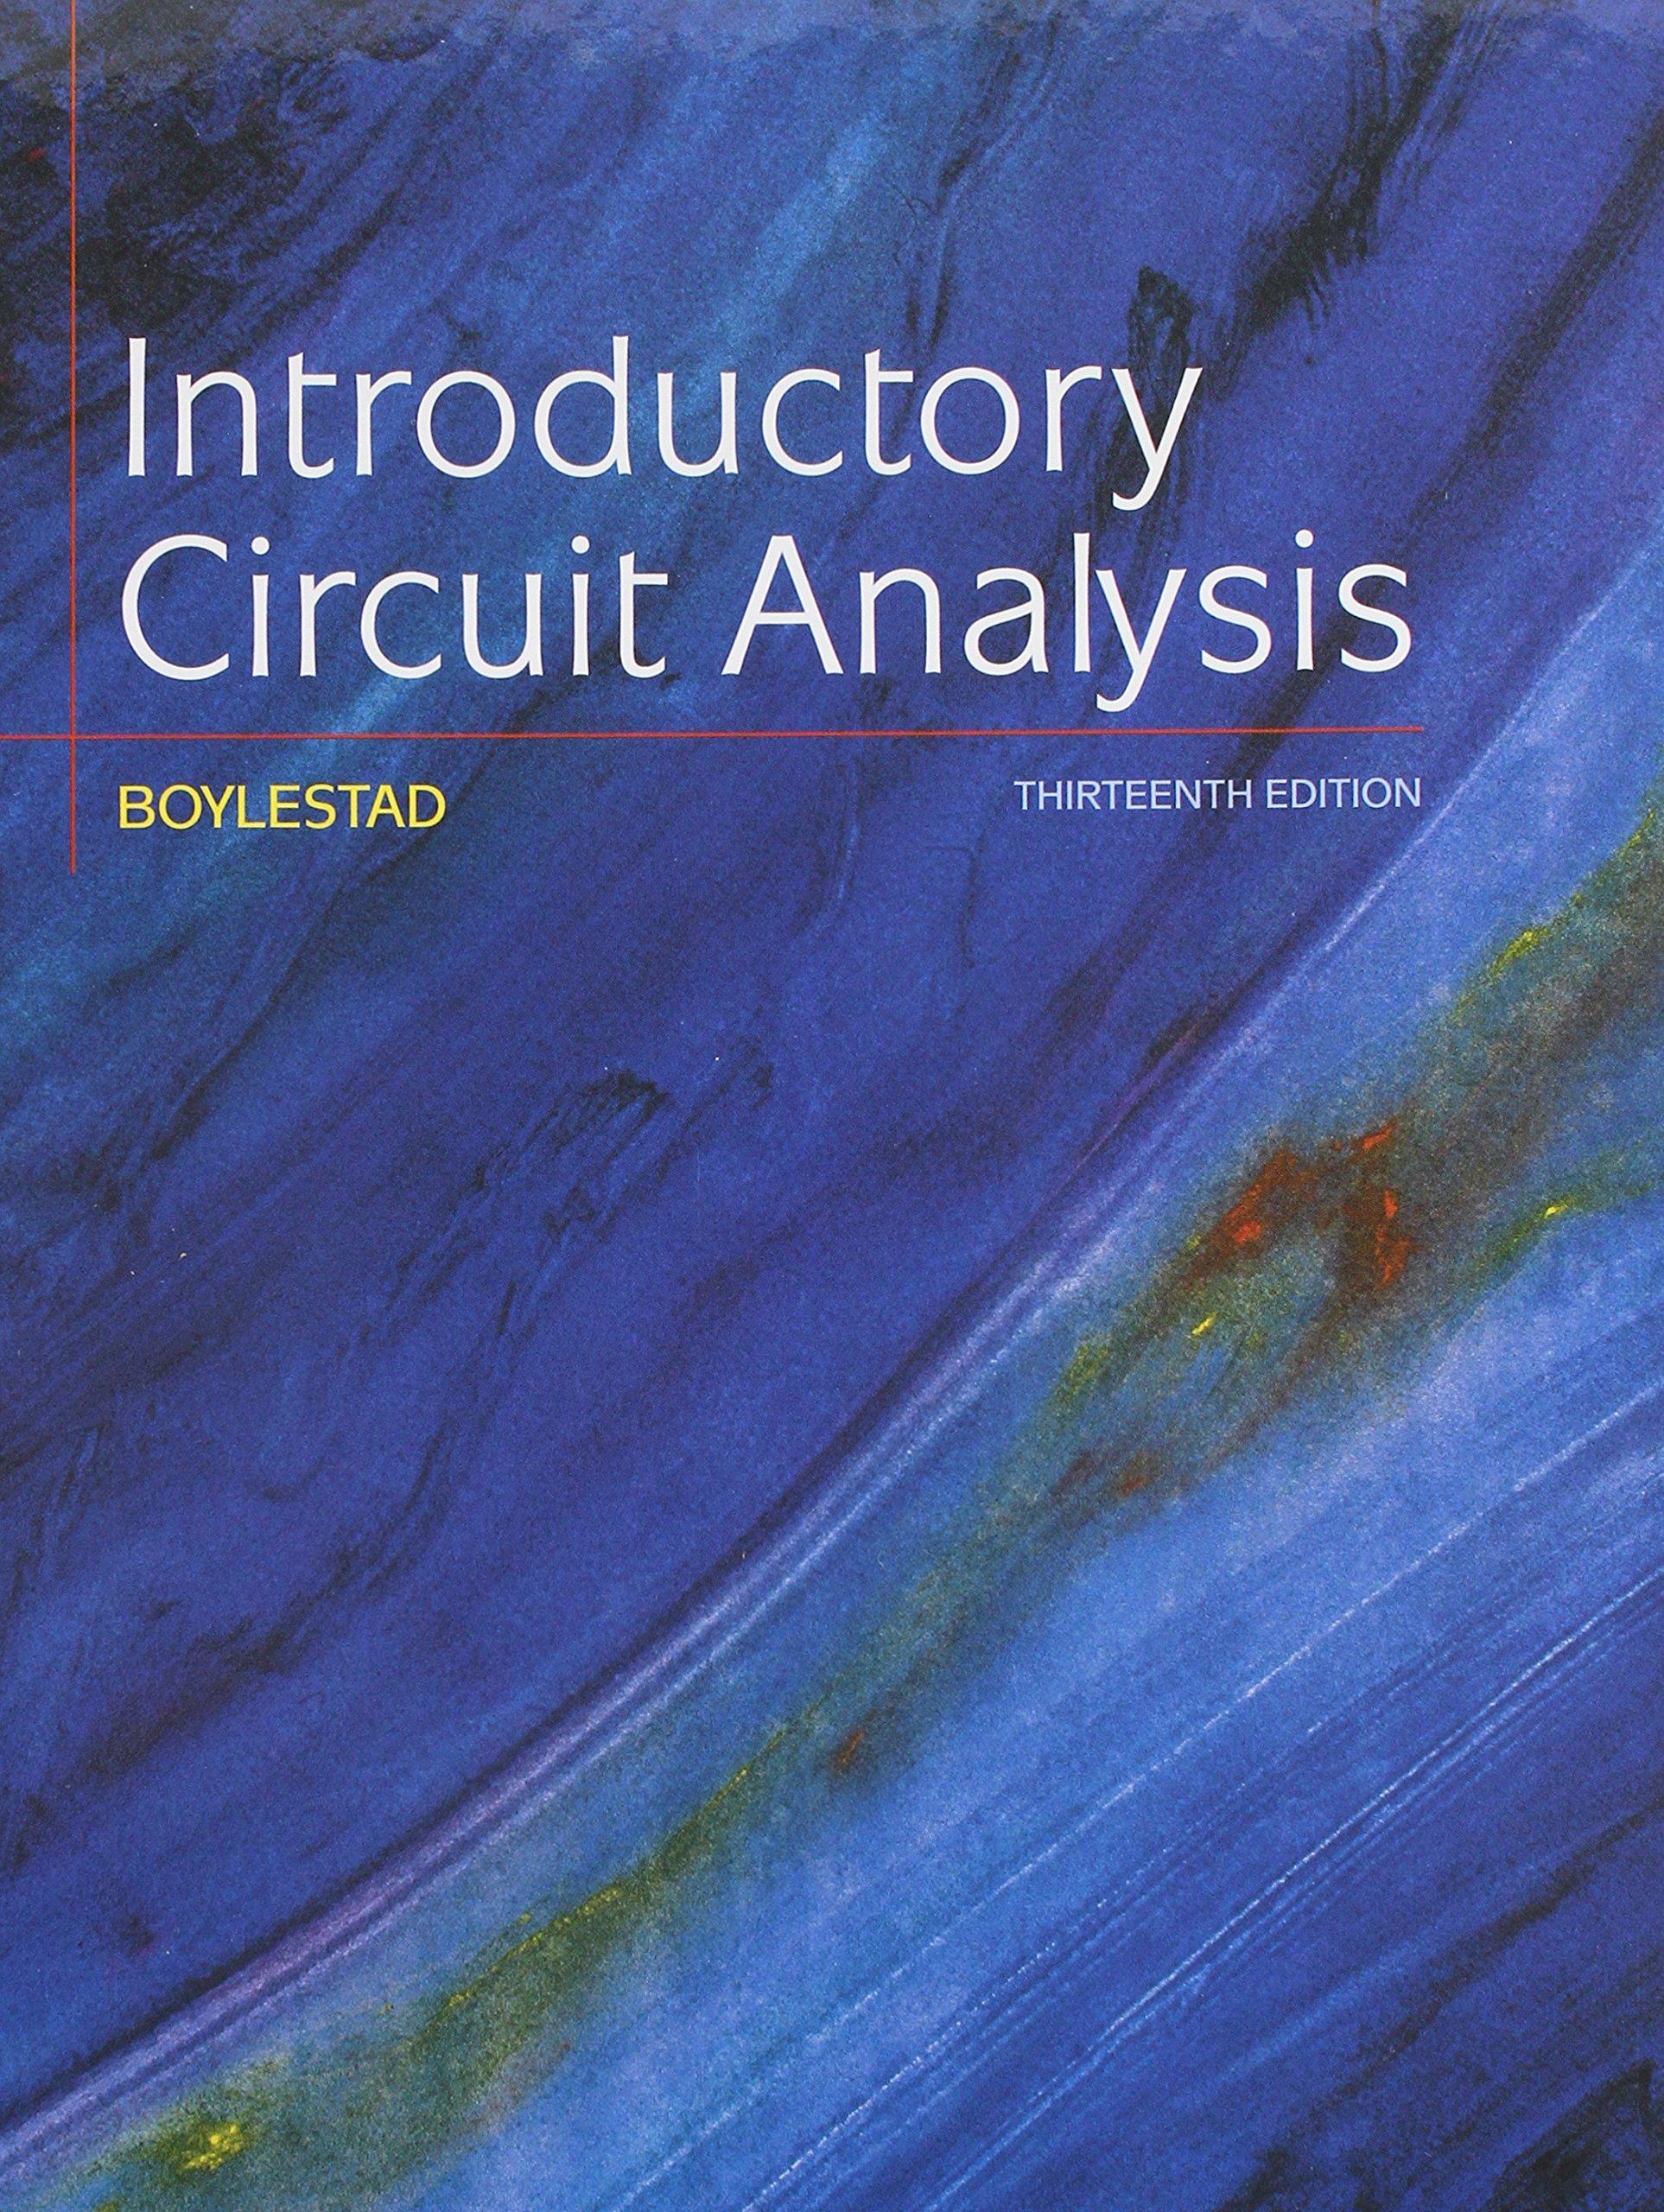 Introductory Circuit Analysis; Laboratory Manual for Introductory Circuit  Analysis: Robert L Boylestad: 9780134297446: Books - Amazon.ca